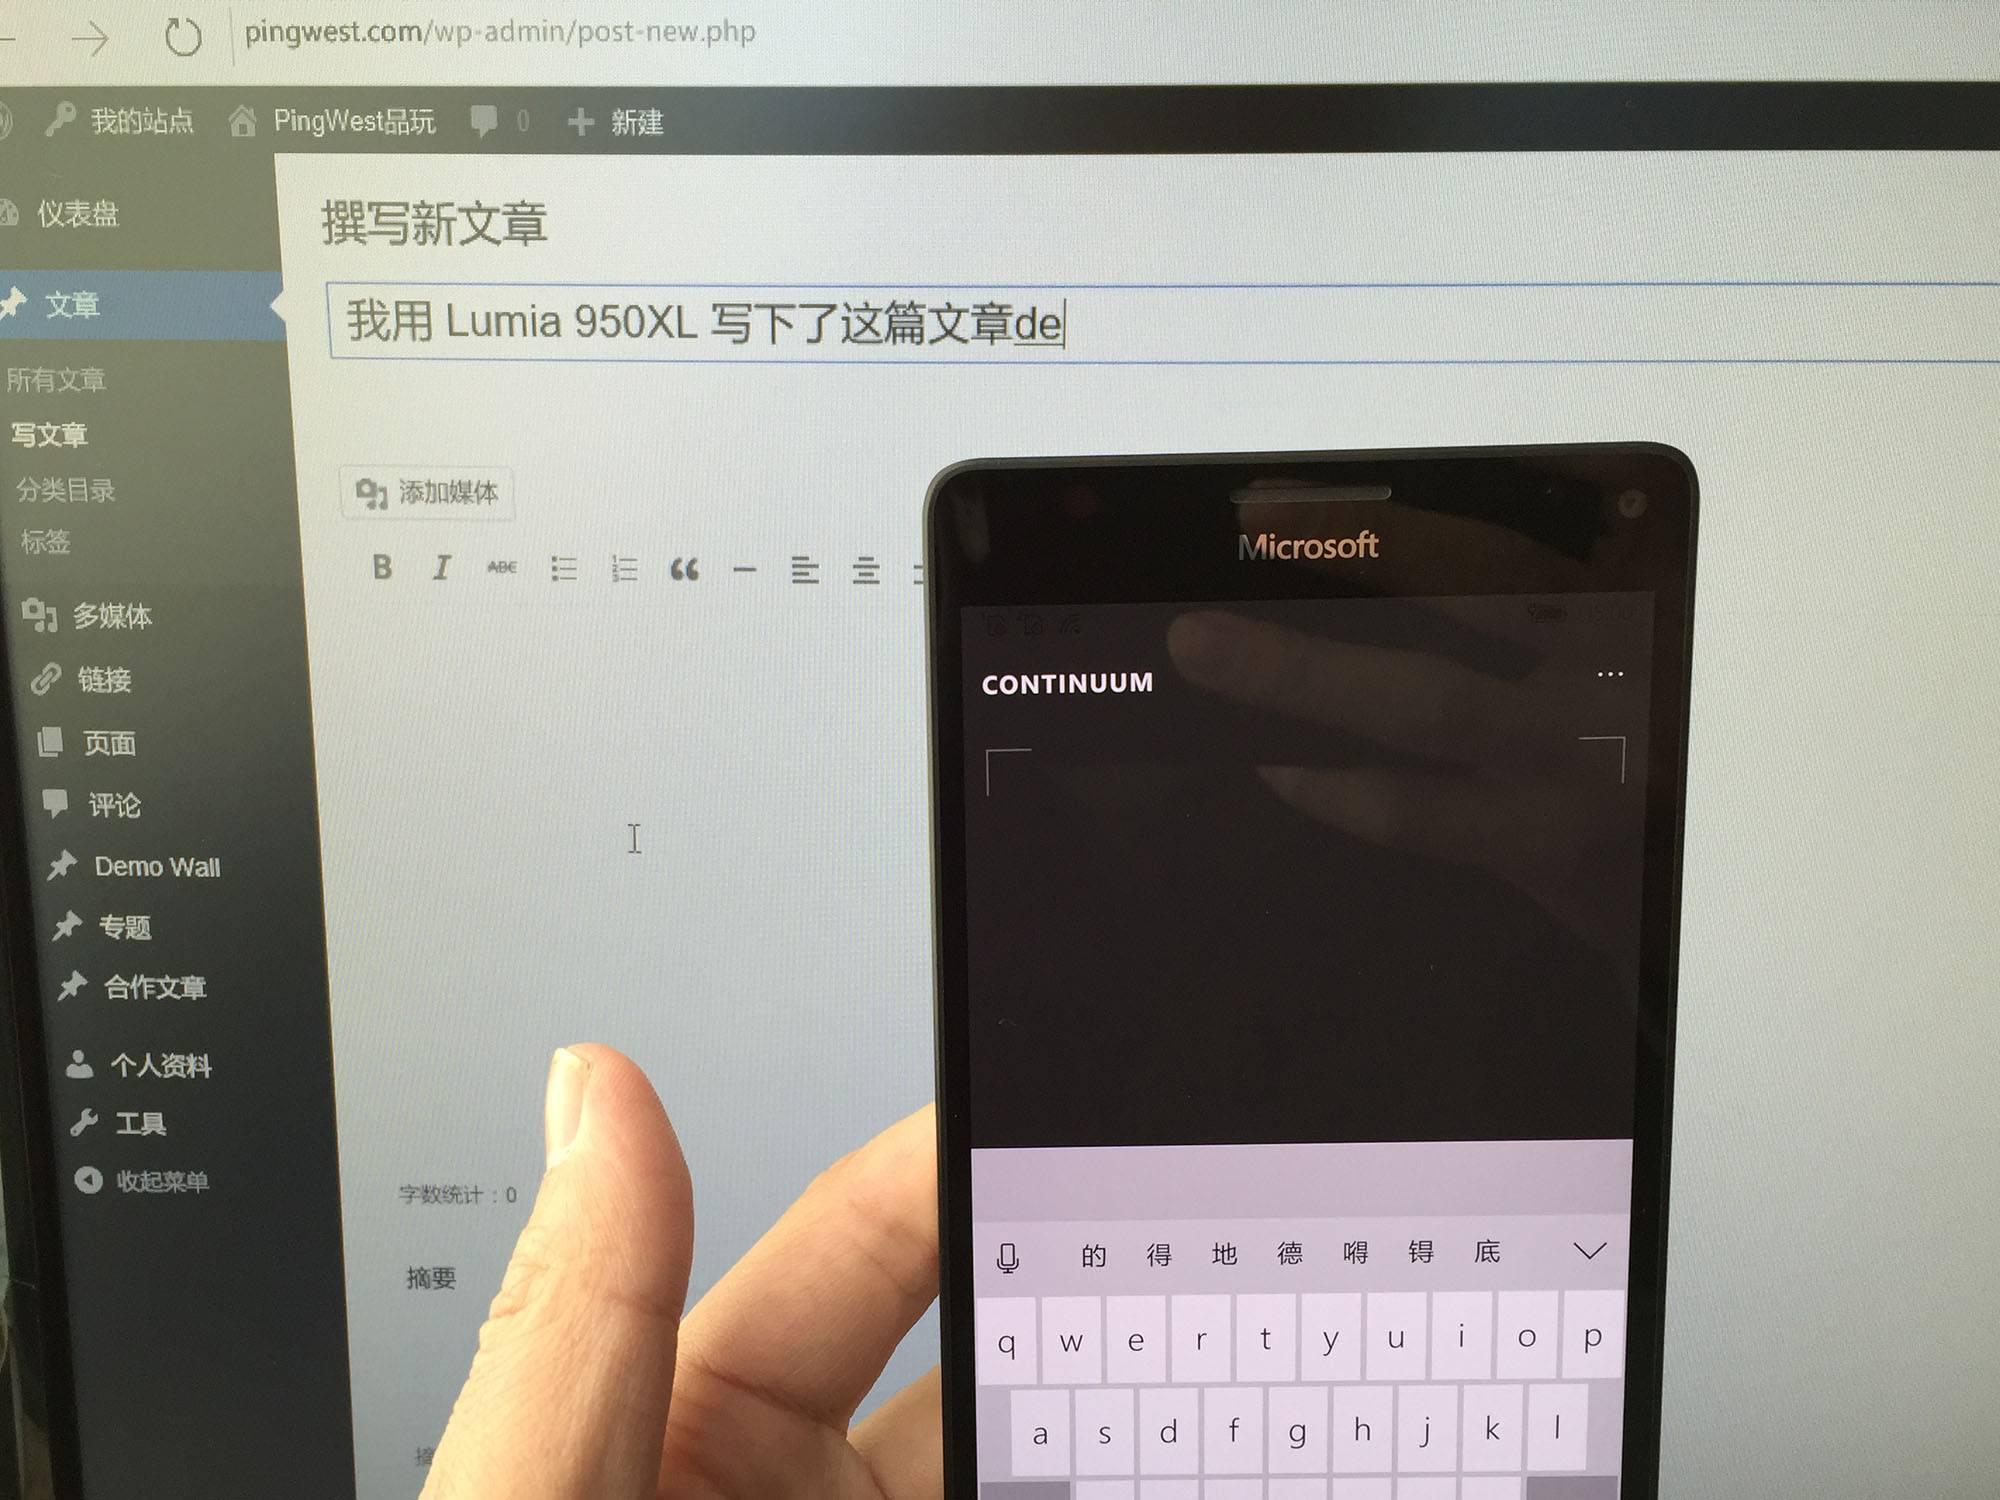 Microsoft Windows 10 Lumia 950XL 950 Continuum 14